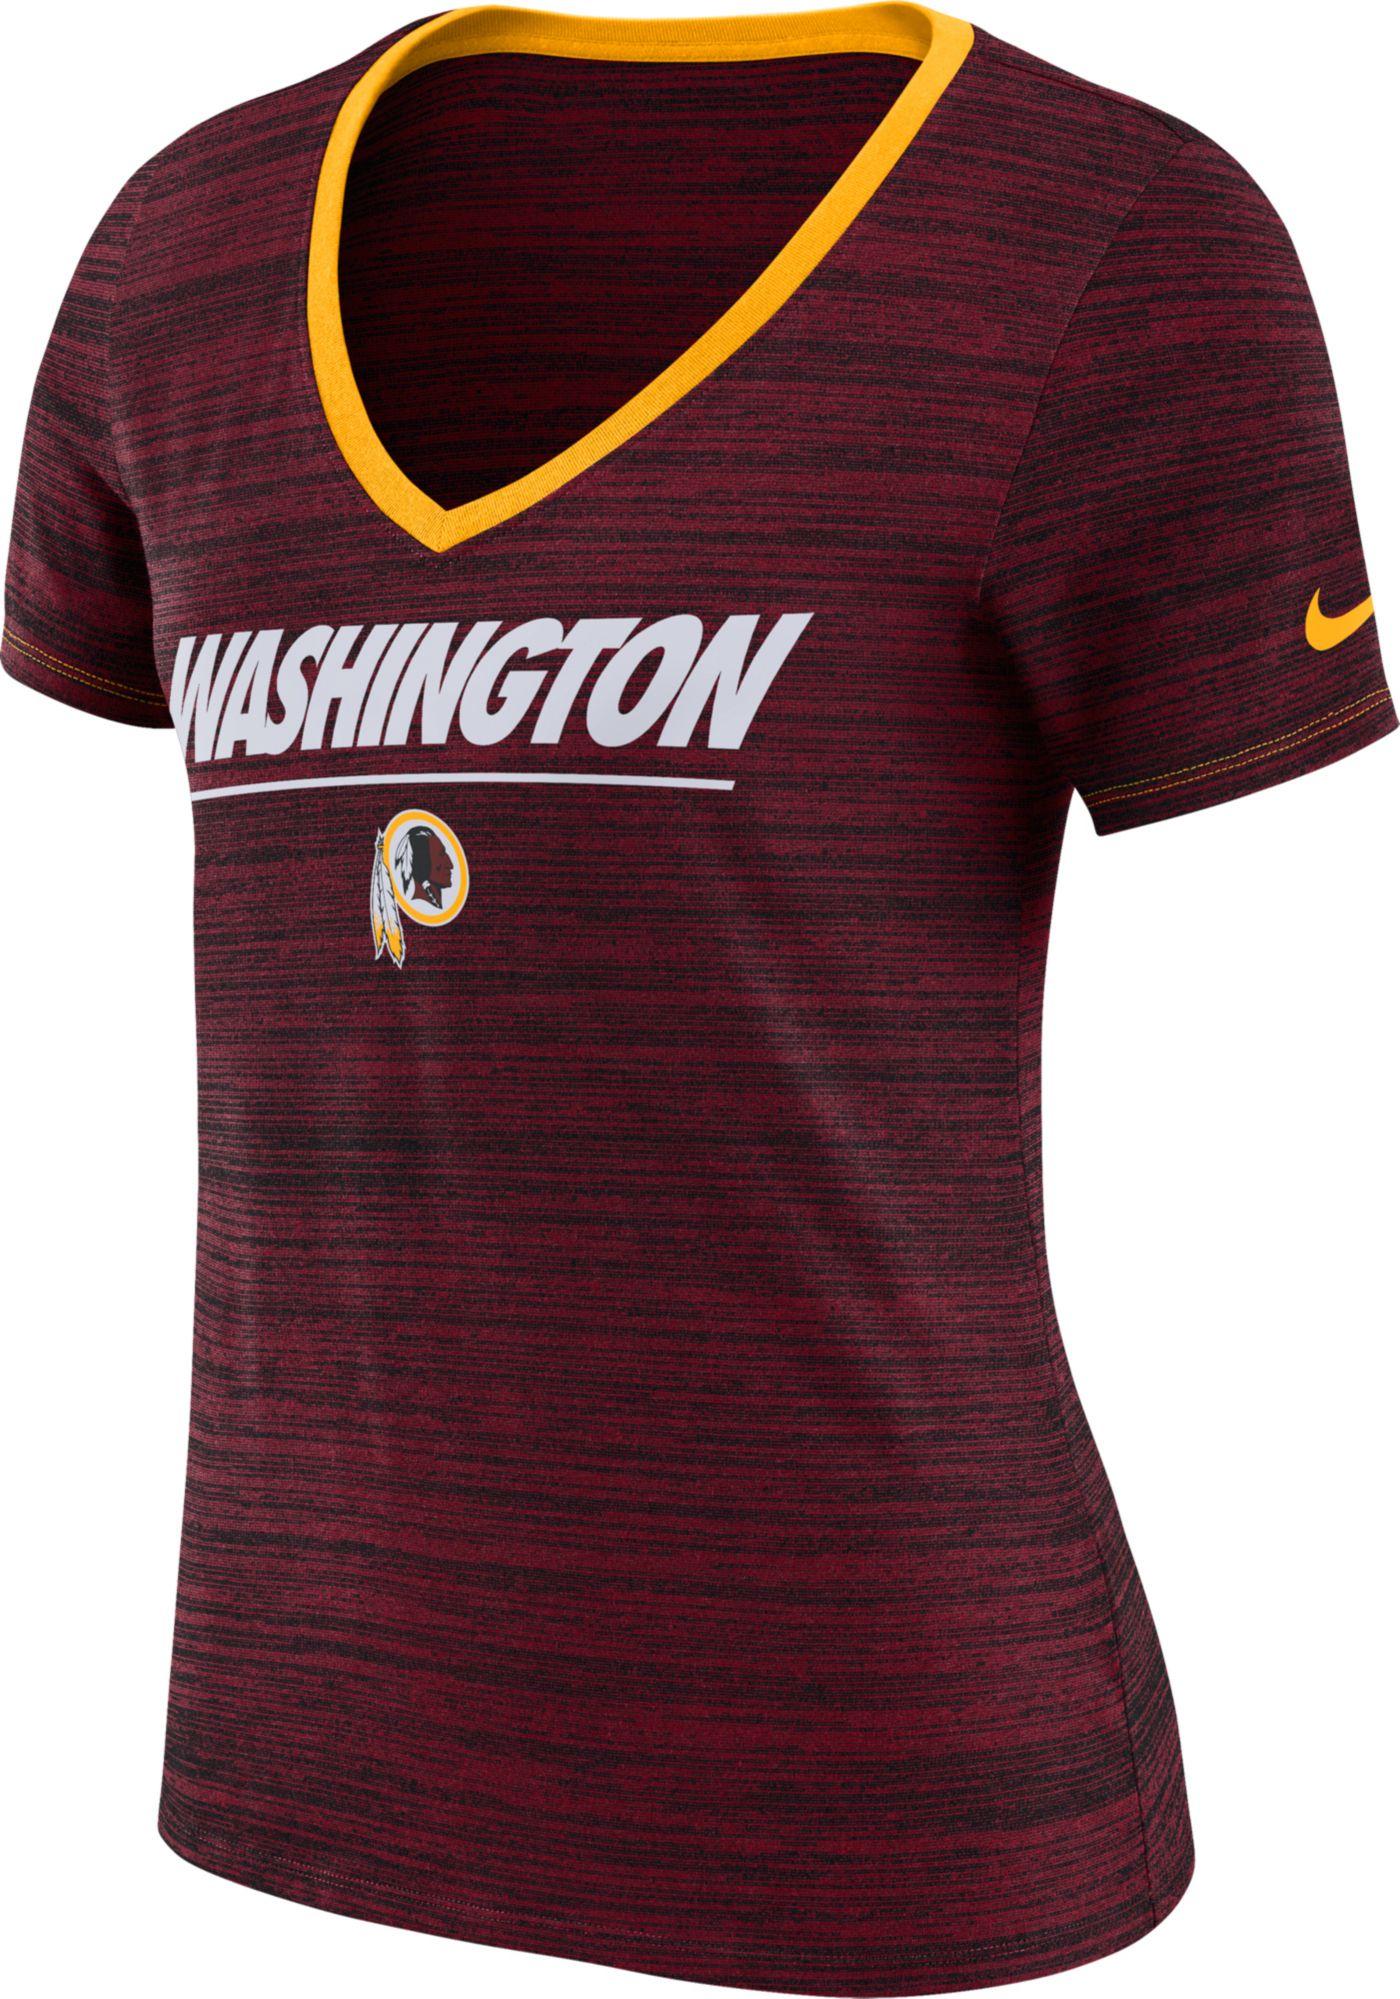 Nike Women's Washington Redskins Legend Velocity Performance Red T-Shirt